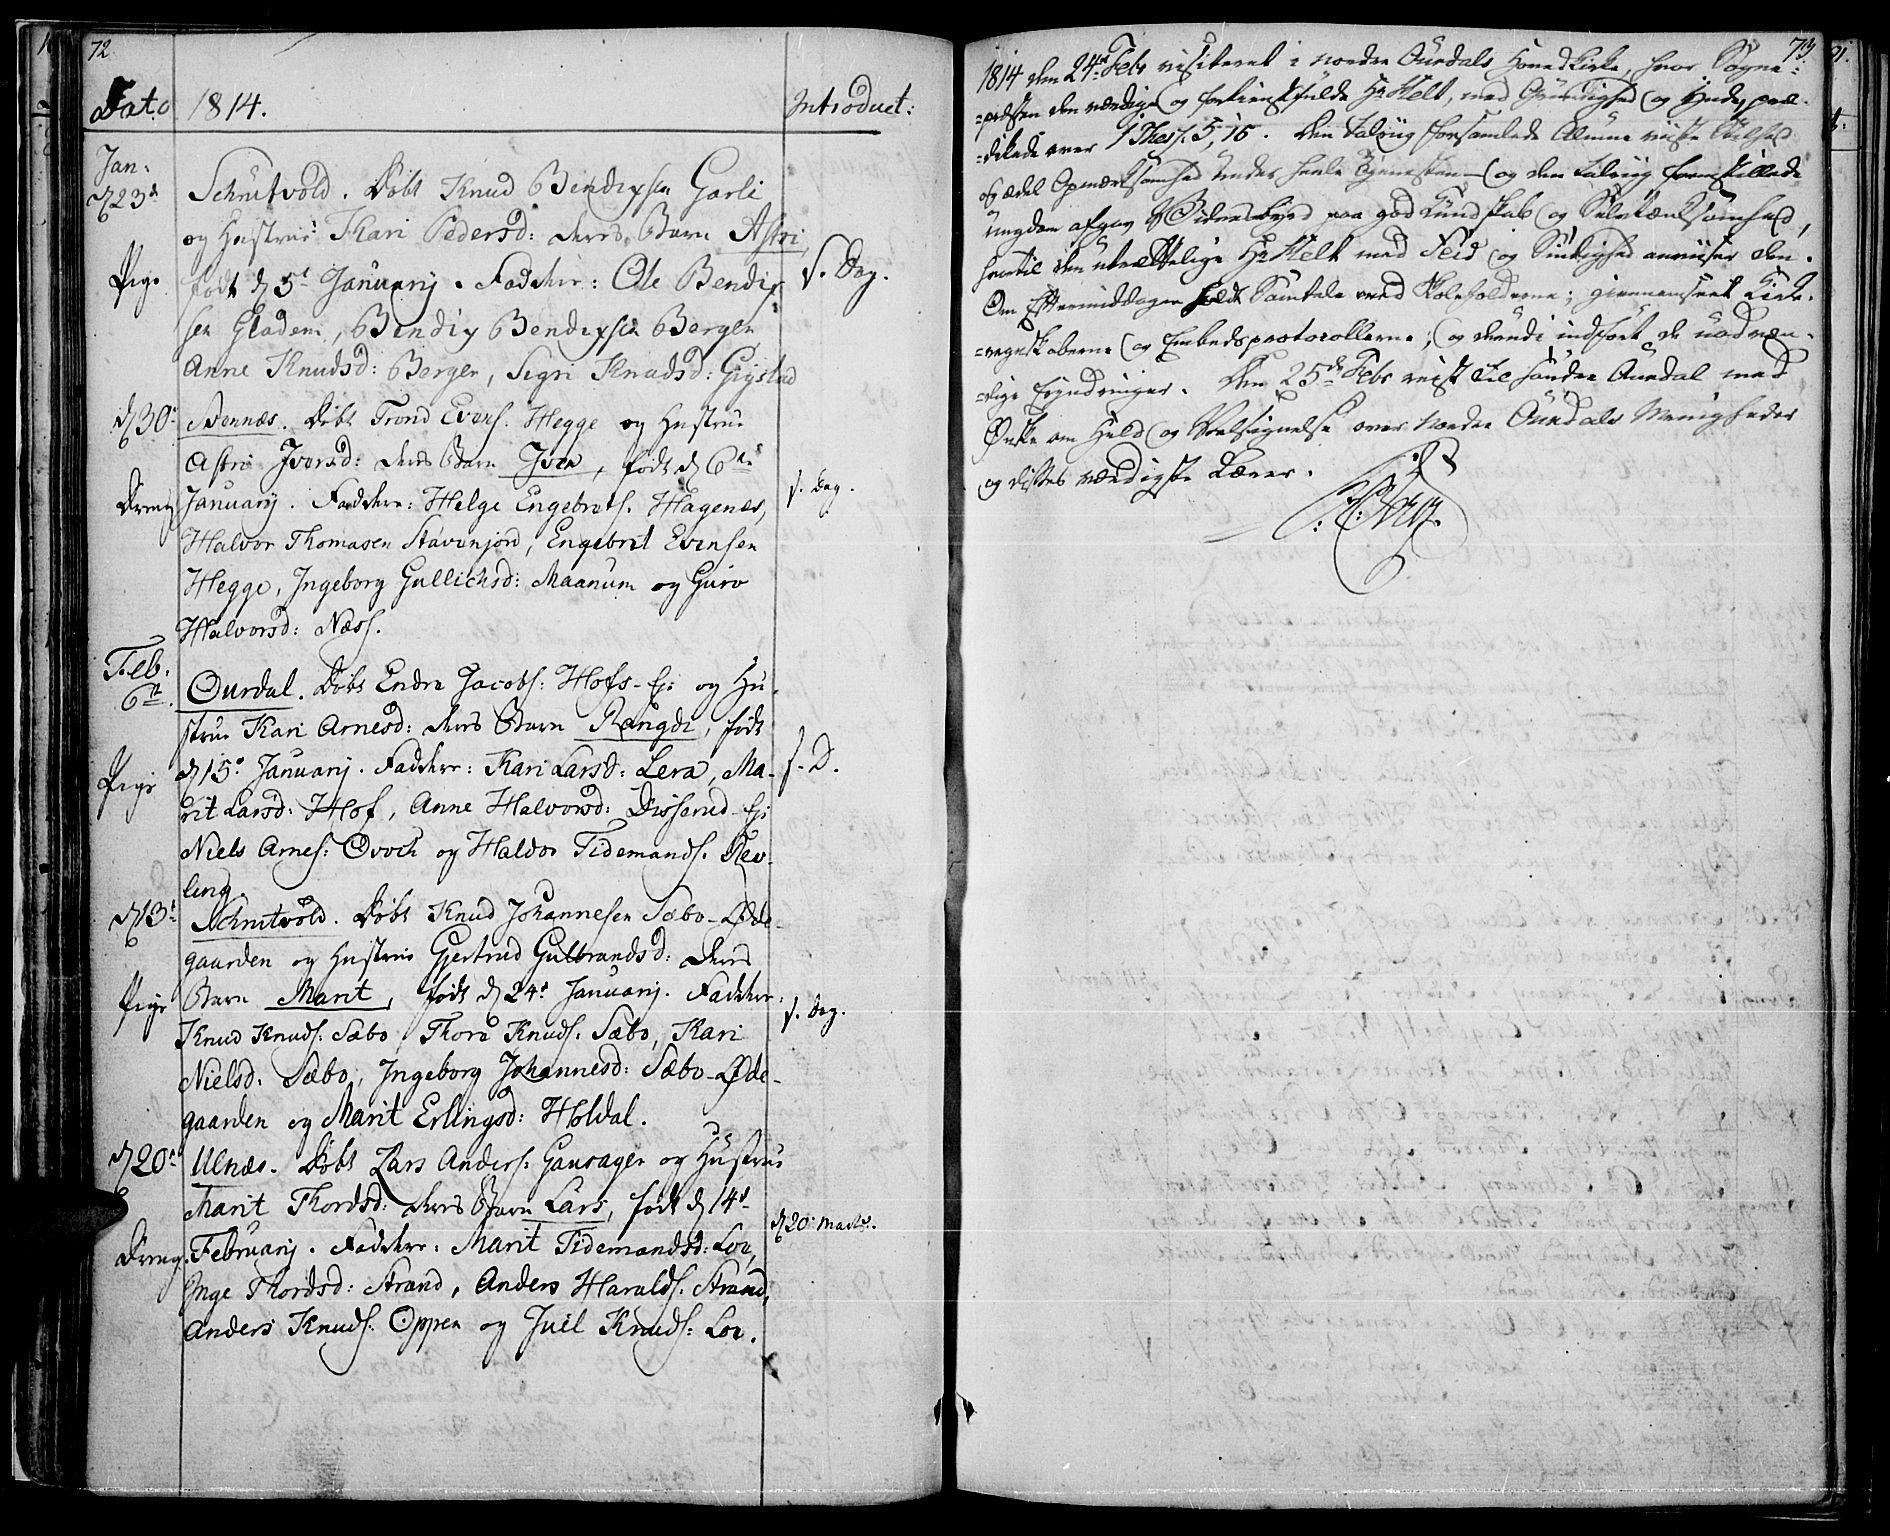 SAH, Nord-Aurdal prestekontor, Ministerialbok nr. 1, 1808-1815, s. 72-73